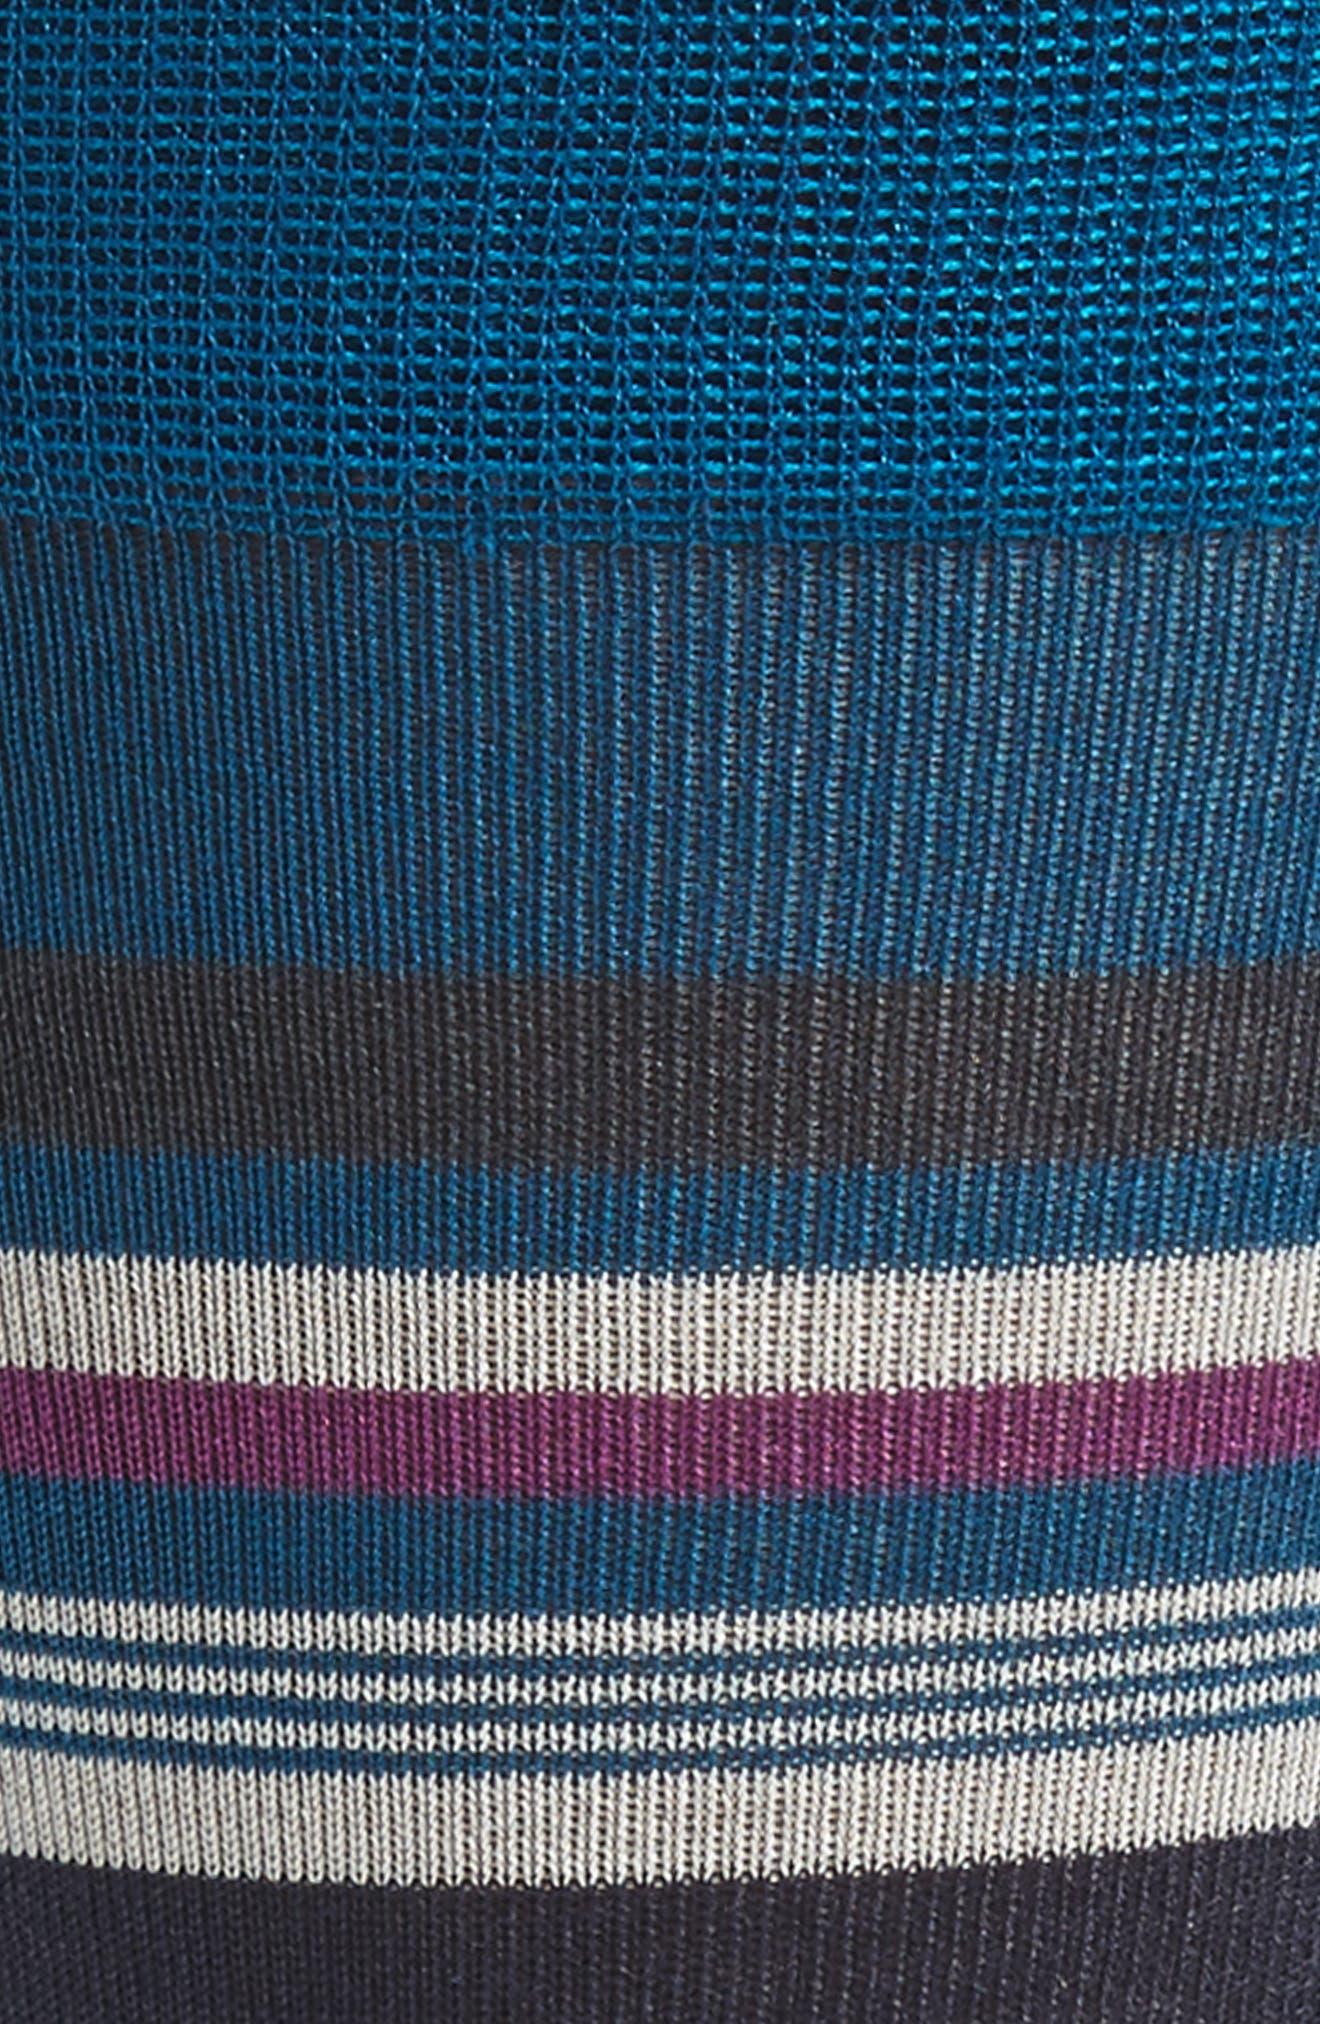 Stripe Socks,                             Alternate thumbnail 2, color,                             Teal Mosaic